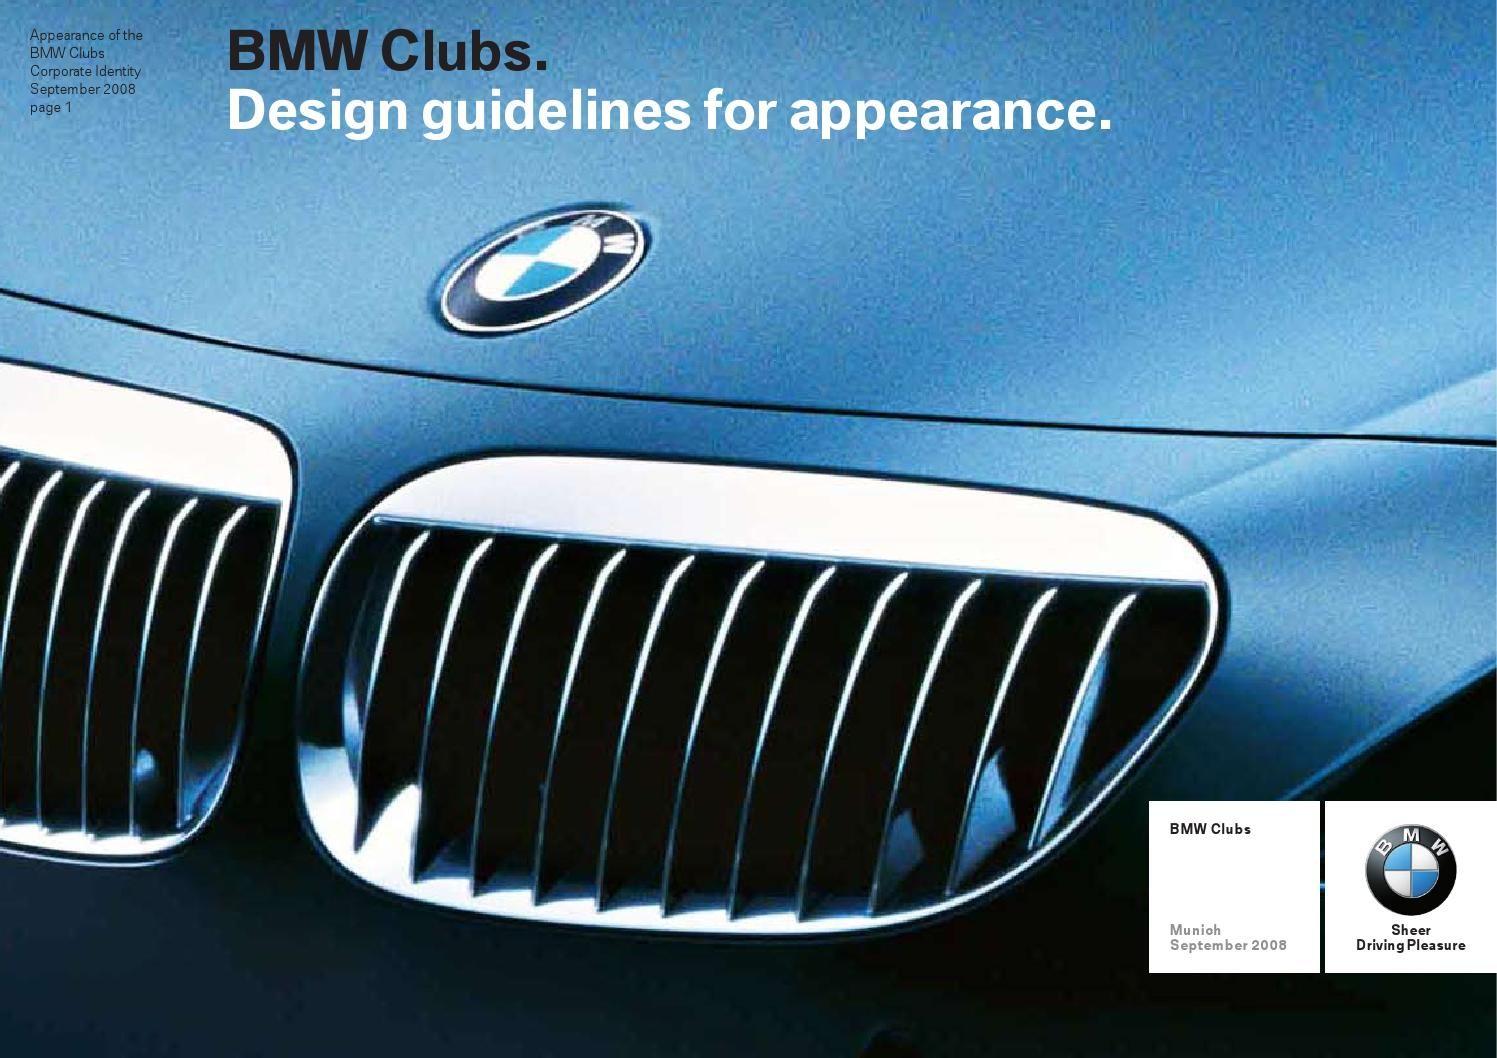 bmw brand guidelines brand books pinterest brand guidelines rh pinterest com bmw corporate identity guidelines pdf Corporate Identity Package